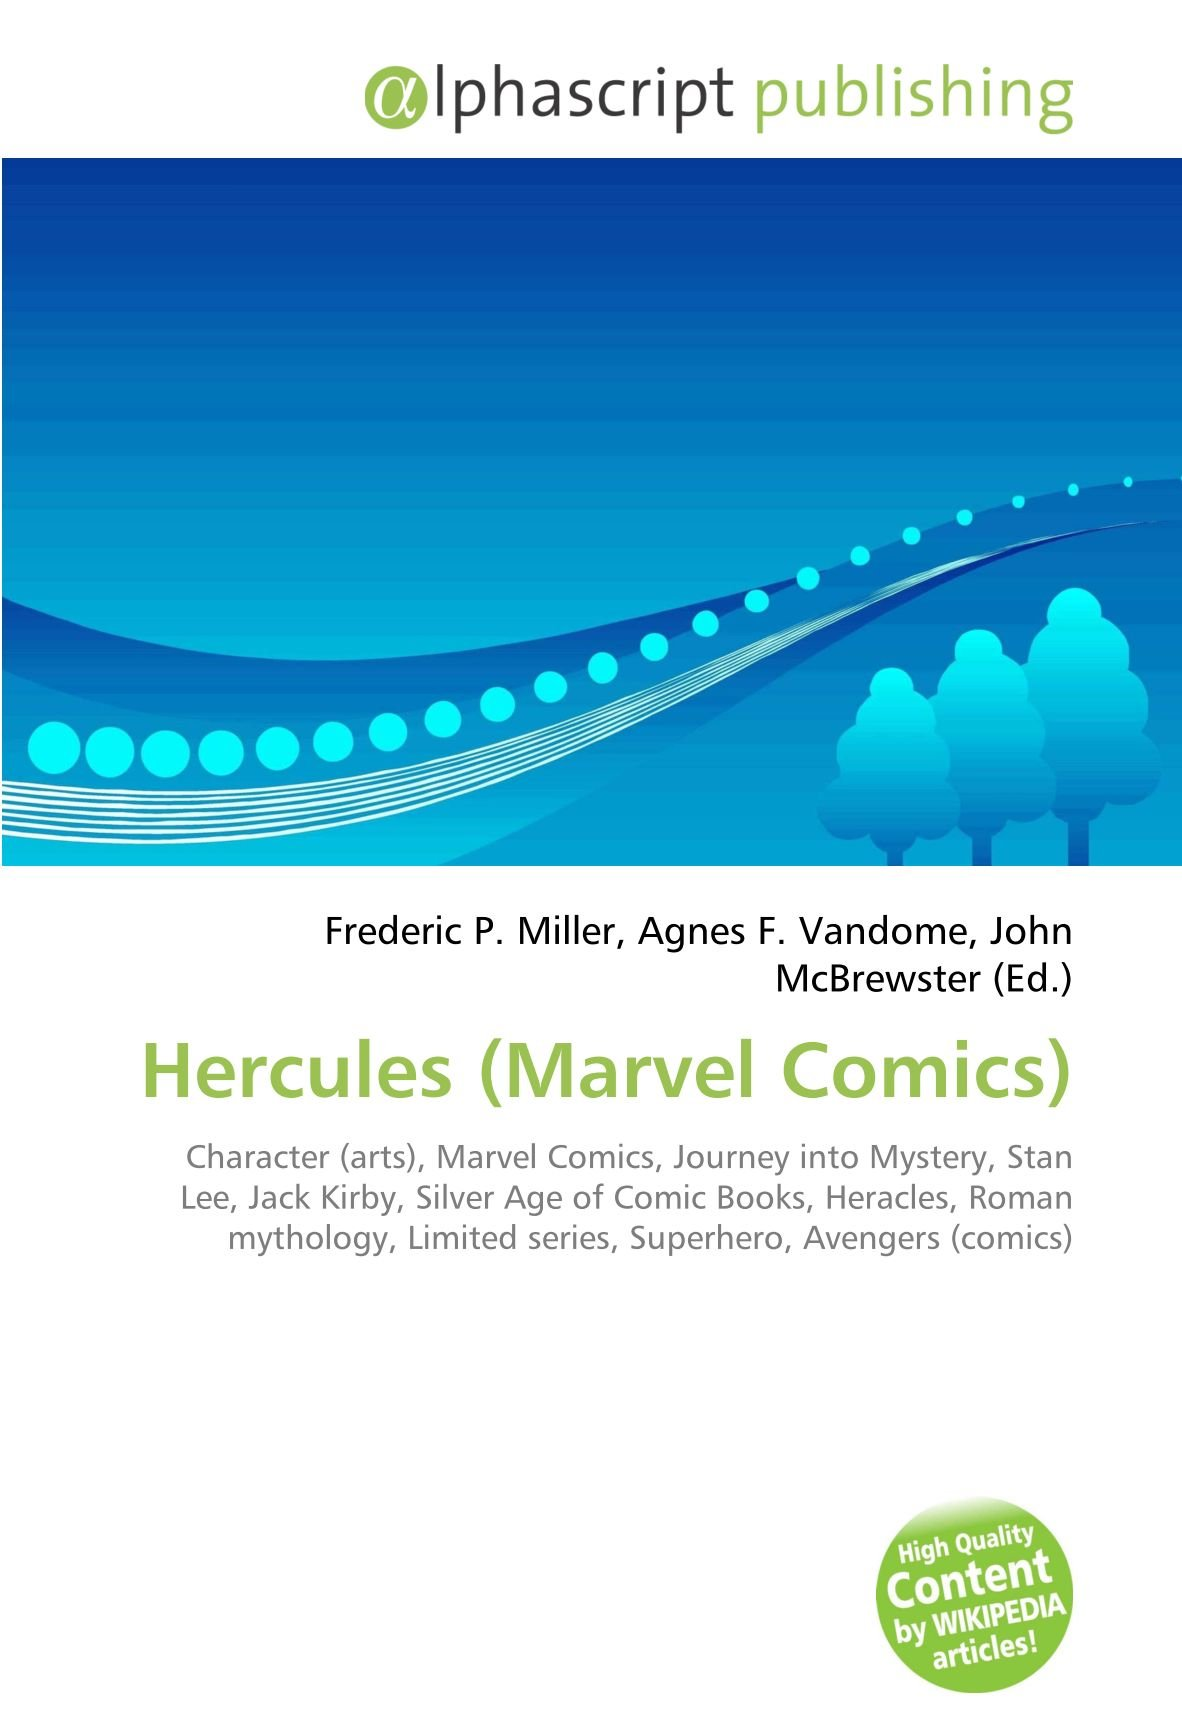 Hercules (Marvel Comics): Amazon.es: Miller, Frederic P, Vandome, Agnes F, McBrewster, John: Libros en idiomas extranjeros